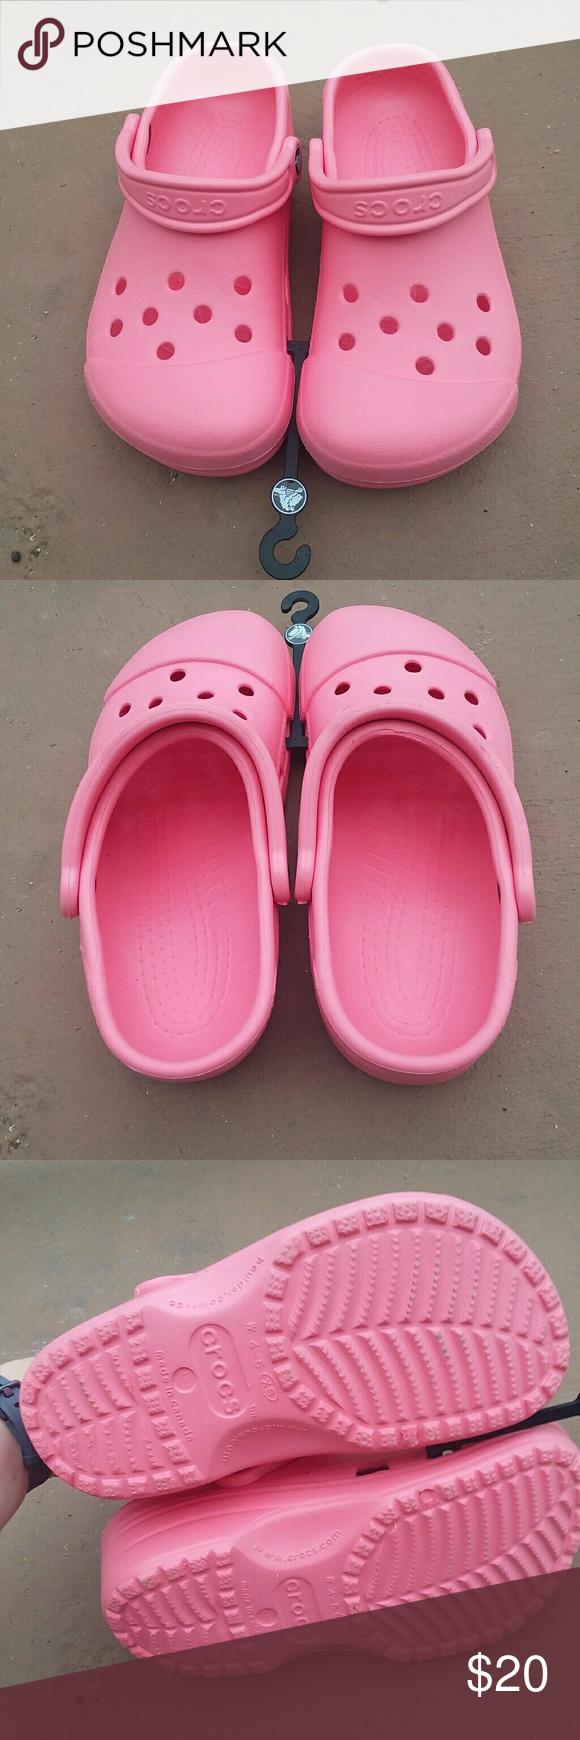 Kids girls Crocs size 4 new | Crocs